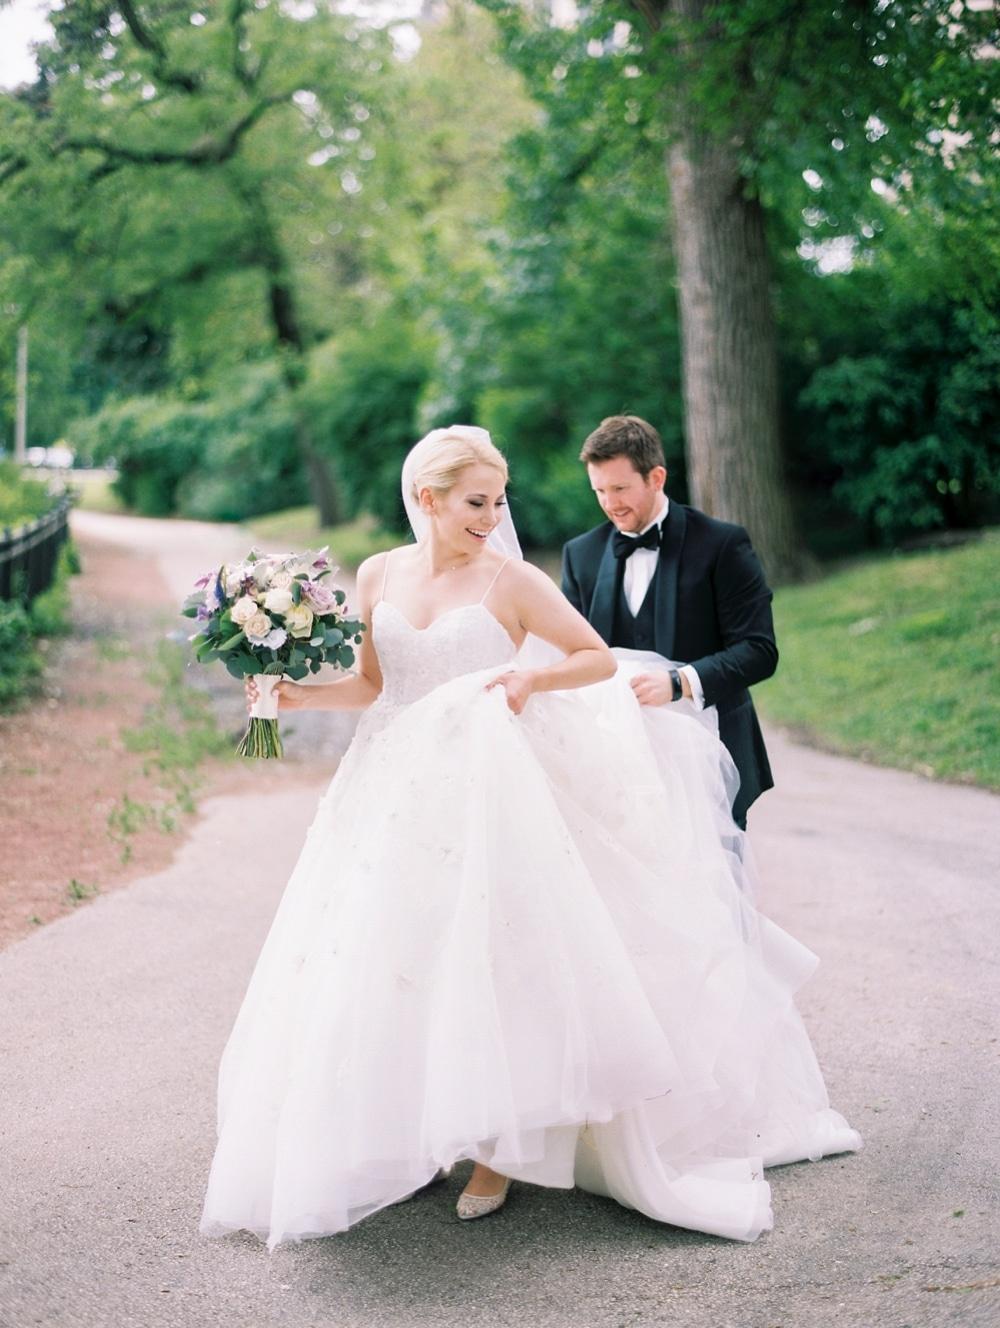 Kristin-La-Voie-Photography-salvatore's-chicago-wedding-photographer-1